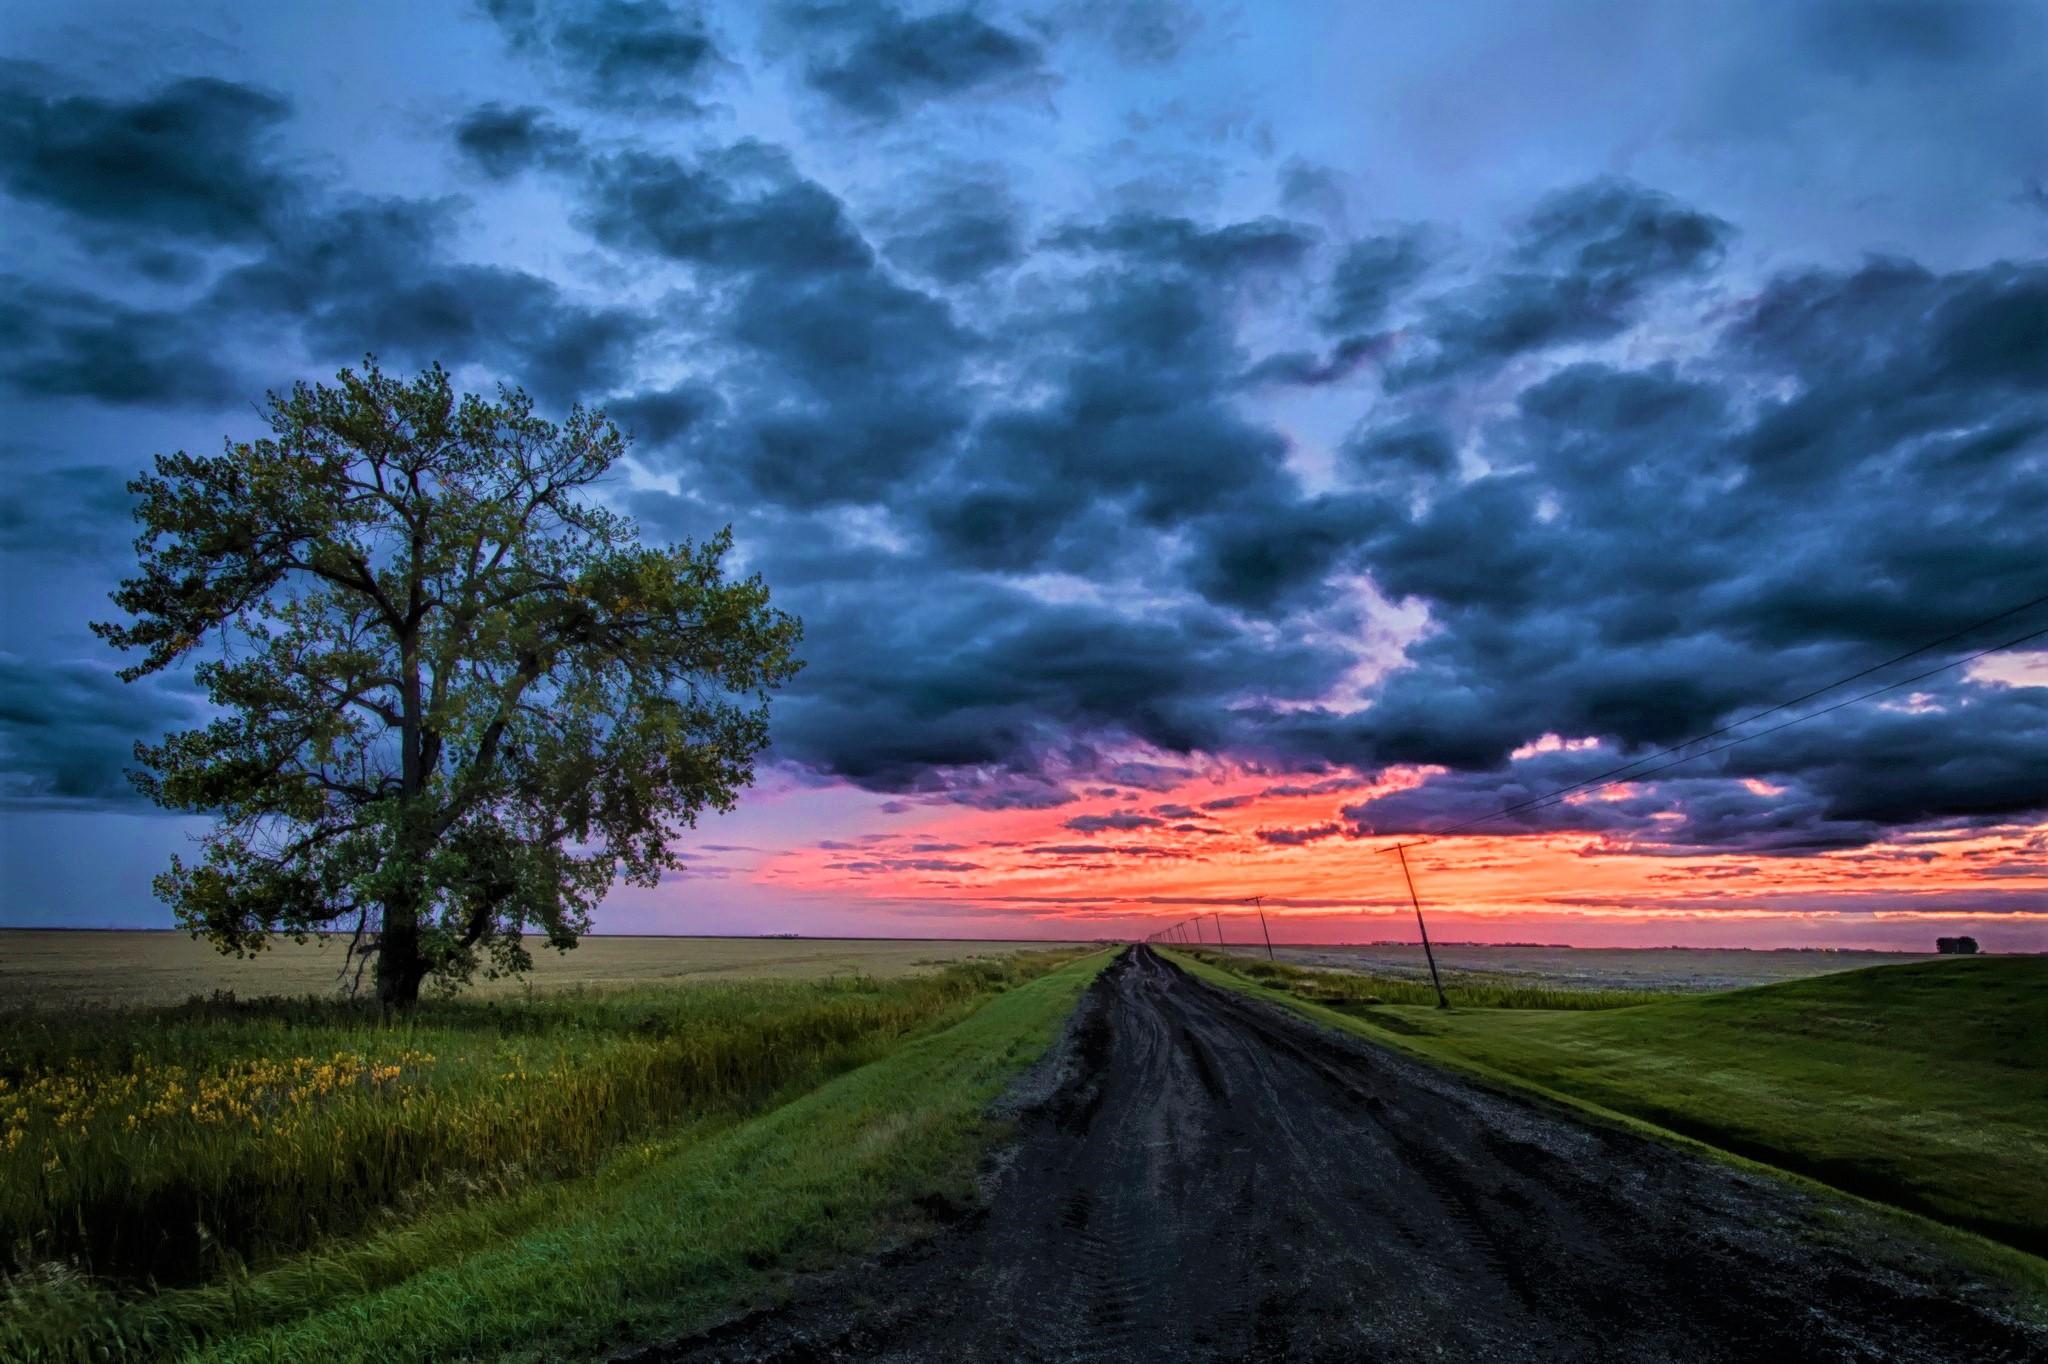 Road At Sunset HD Wallpaper